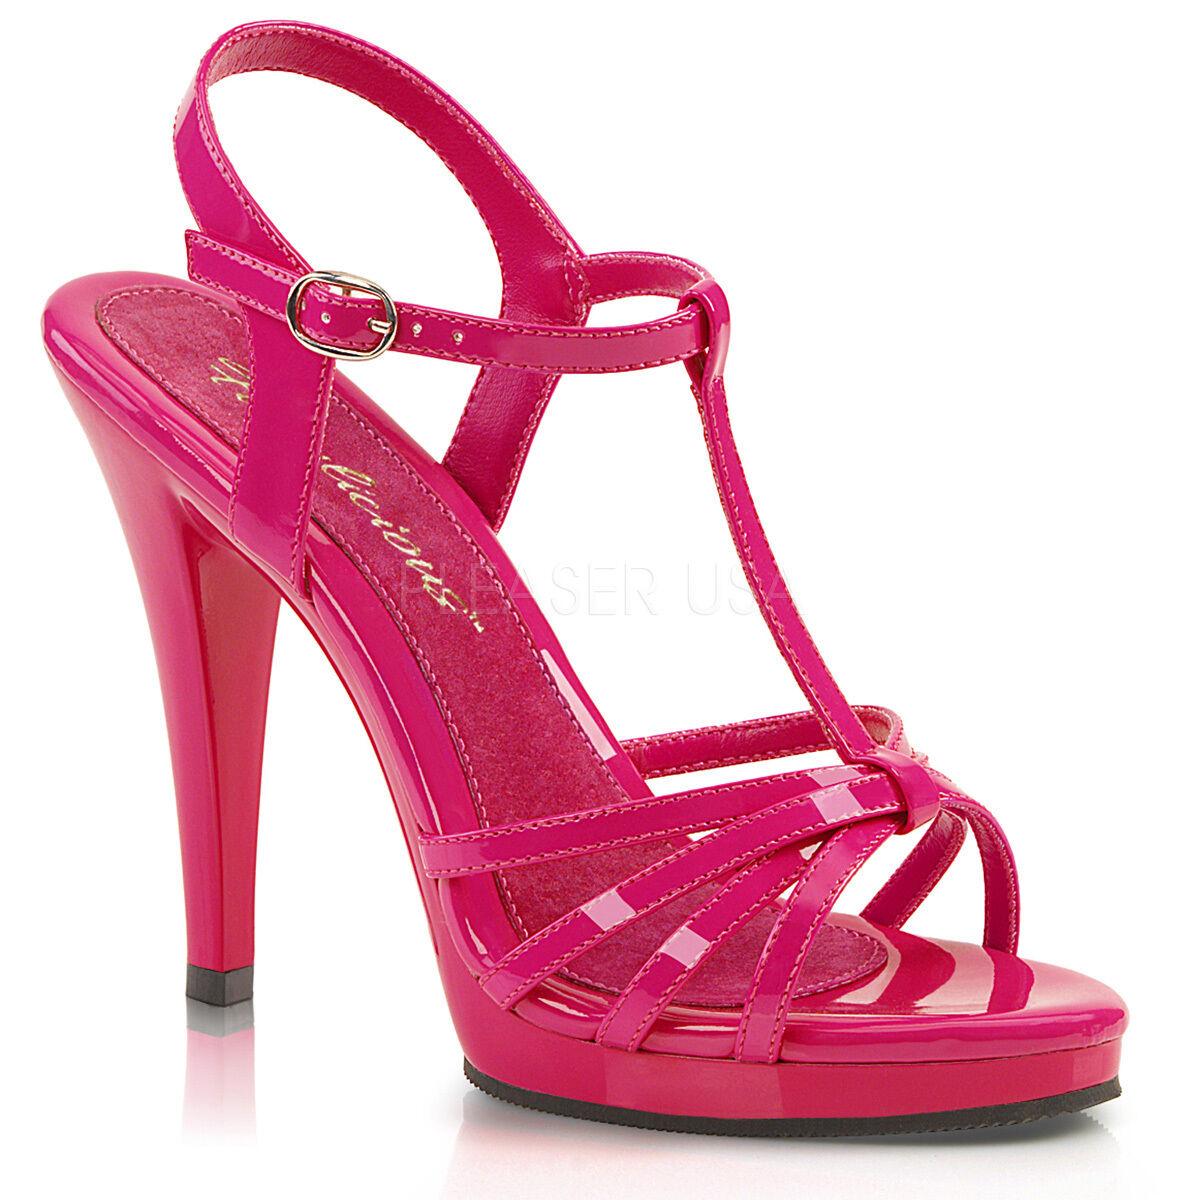 Fabulicious 4.5  Heel Mini Platform Hot Pink Buckle Multi Strap Sandals 5-16